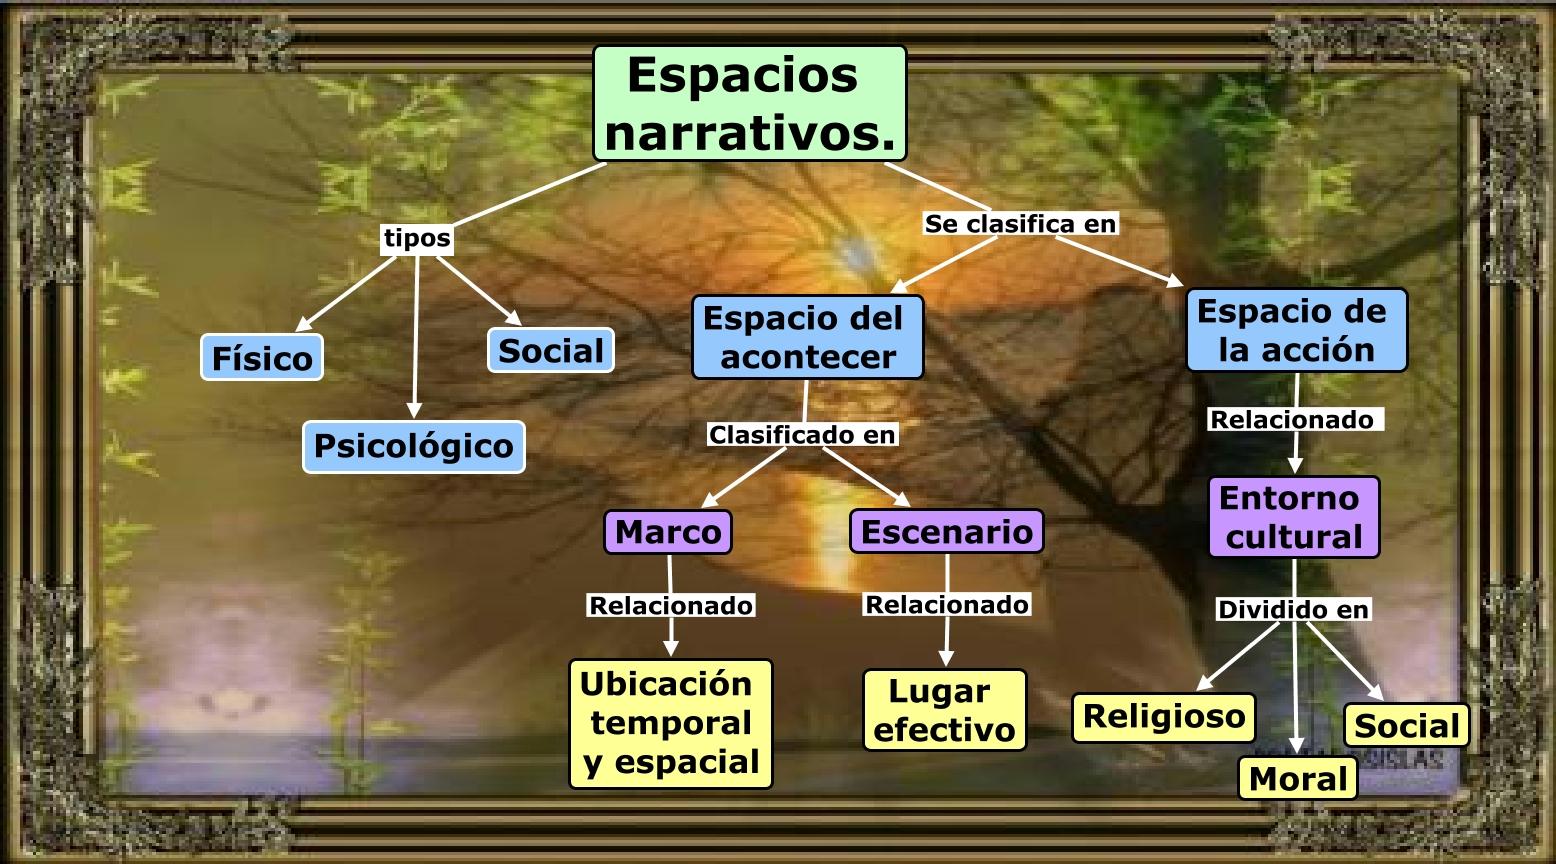 Espacios narrativos - Tipos de espacios ...